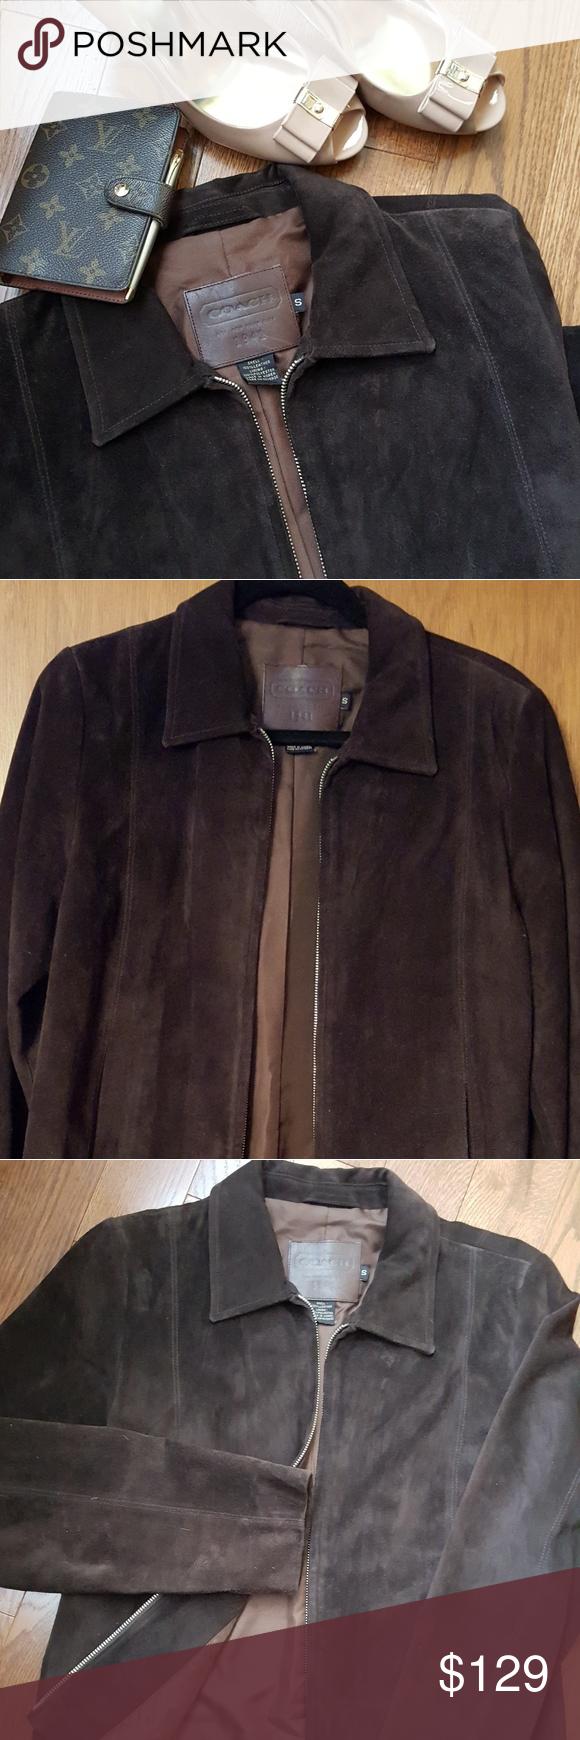 Coach suede leather jacket Leather jacket, Jackets